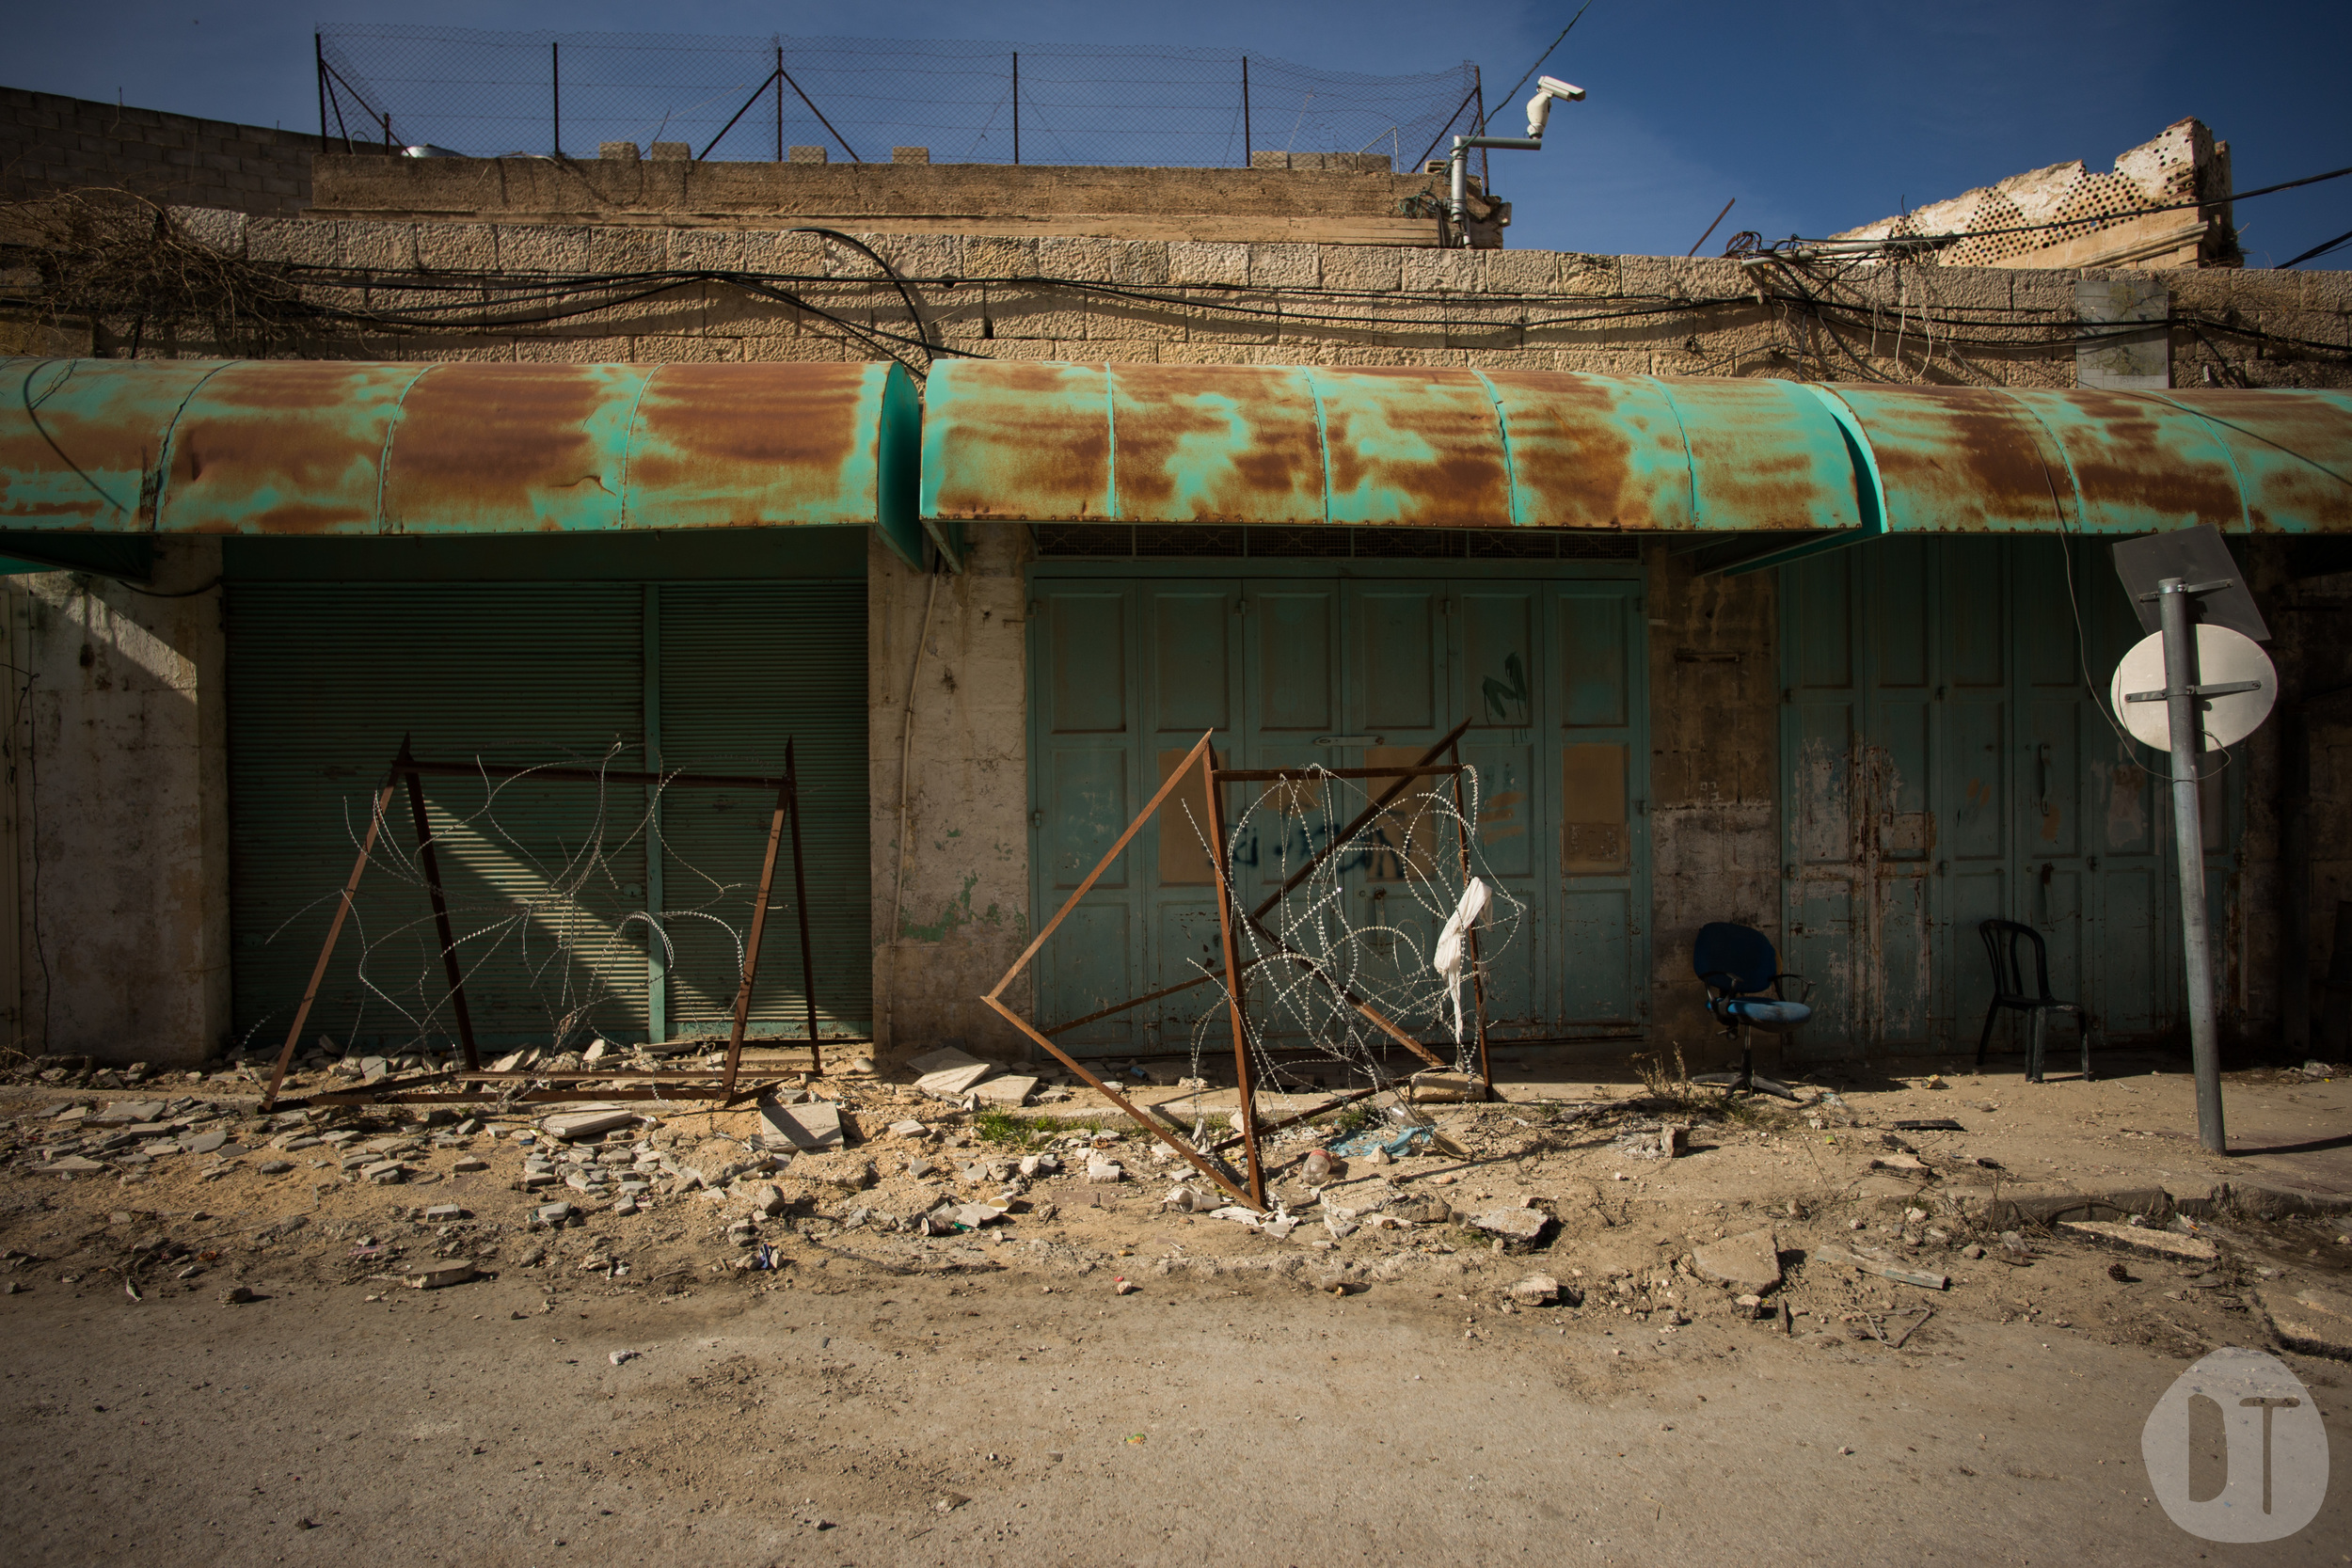 The Hebron enclave has a strong security presence.